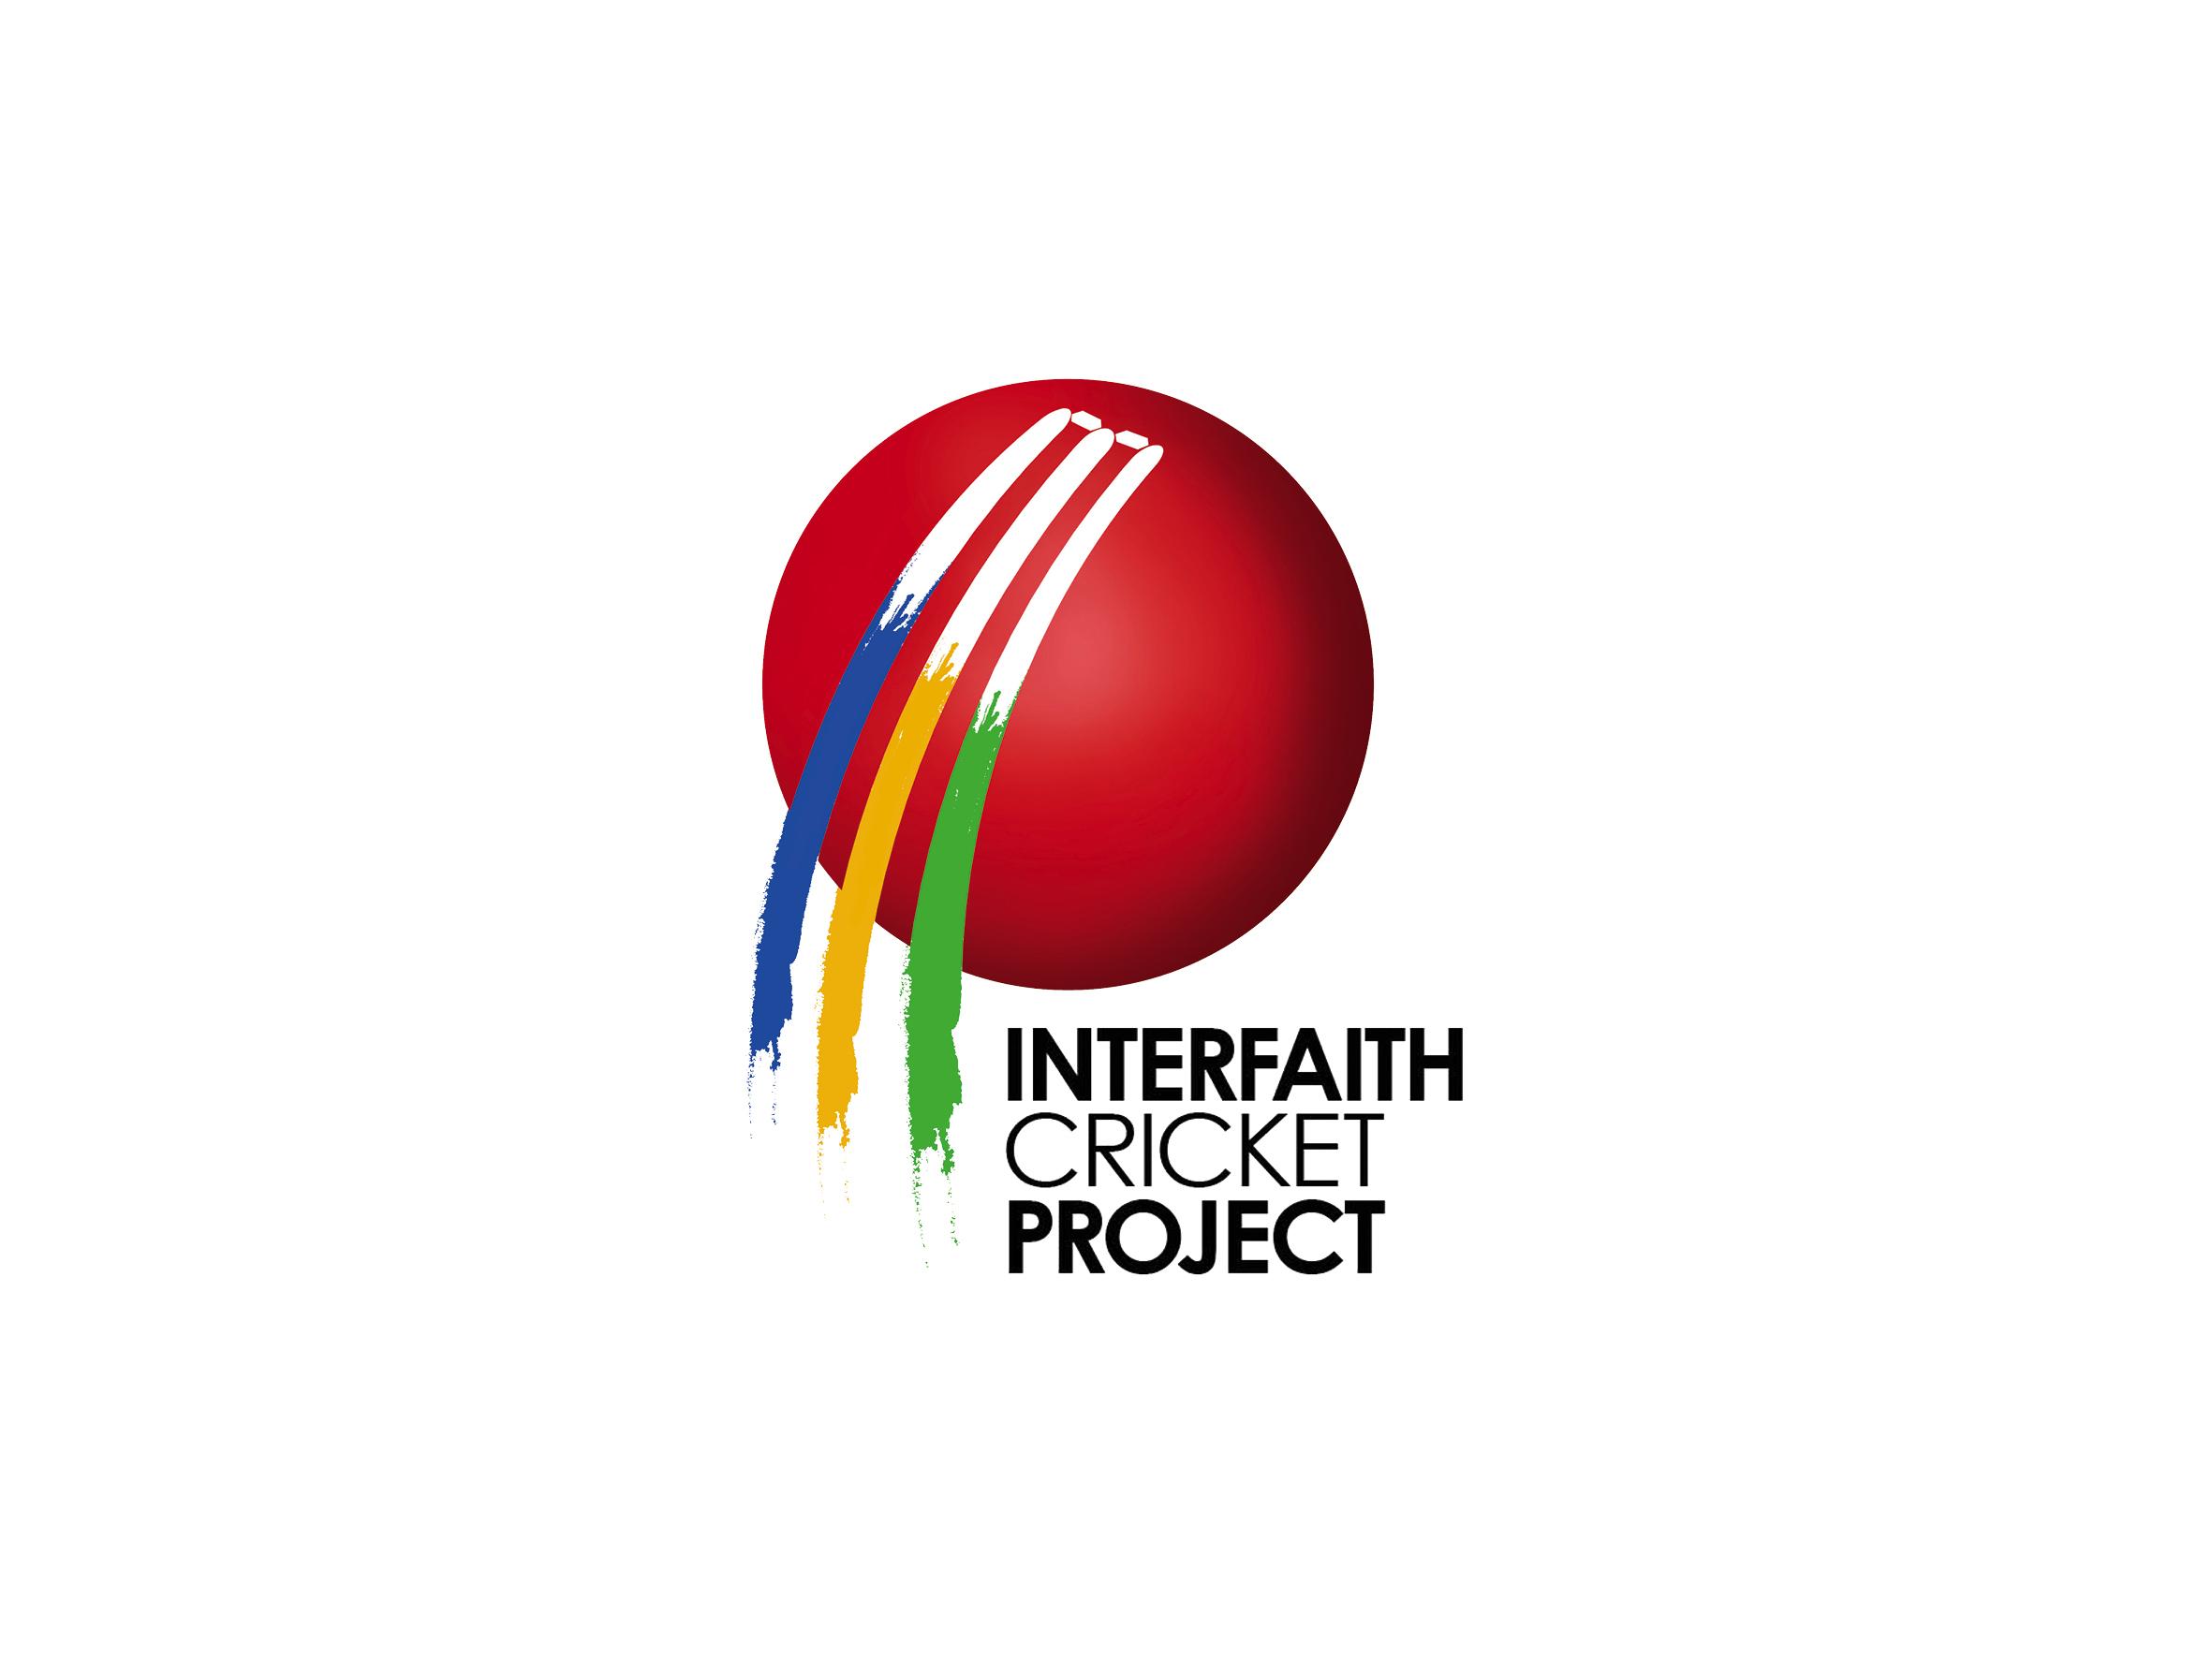 interfaith cricket project leeds logo design designed by Dakini Design Saltaire, Shipley, Bradford